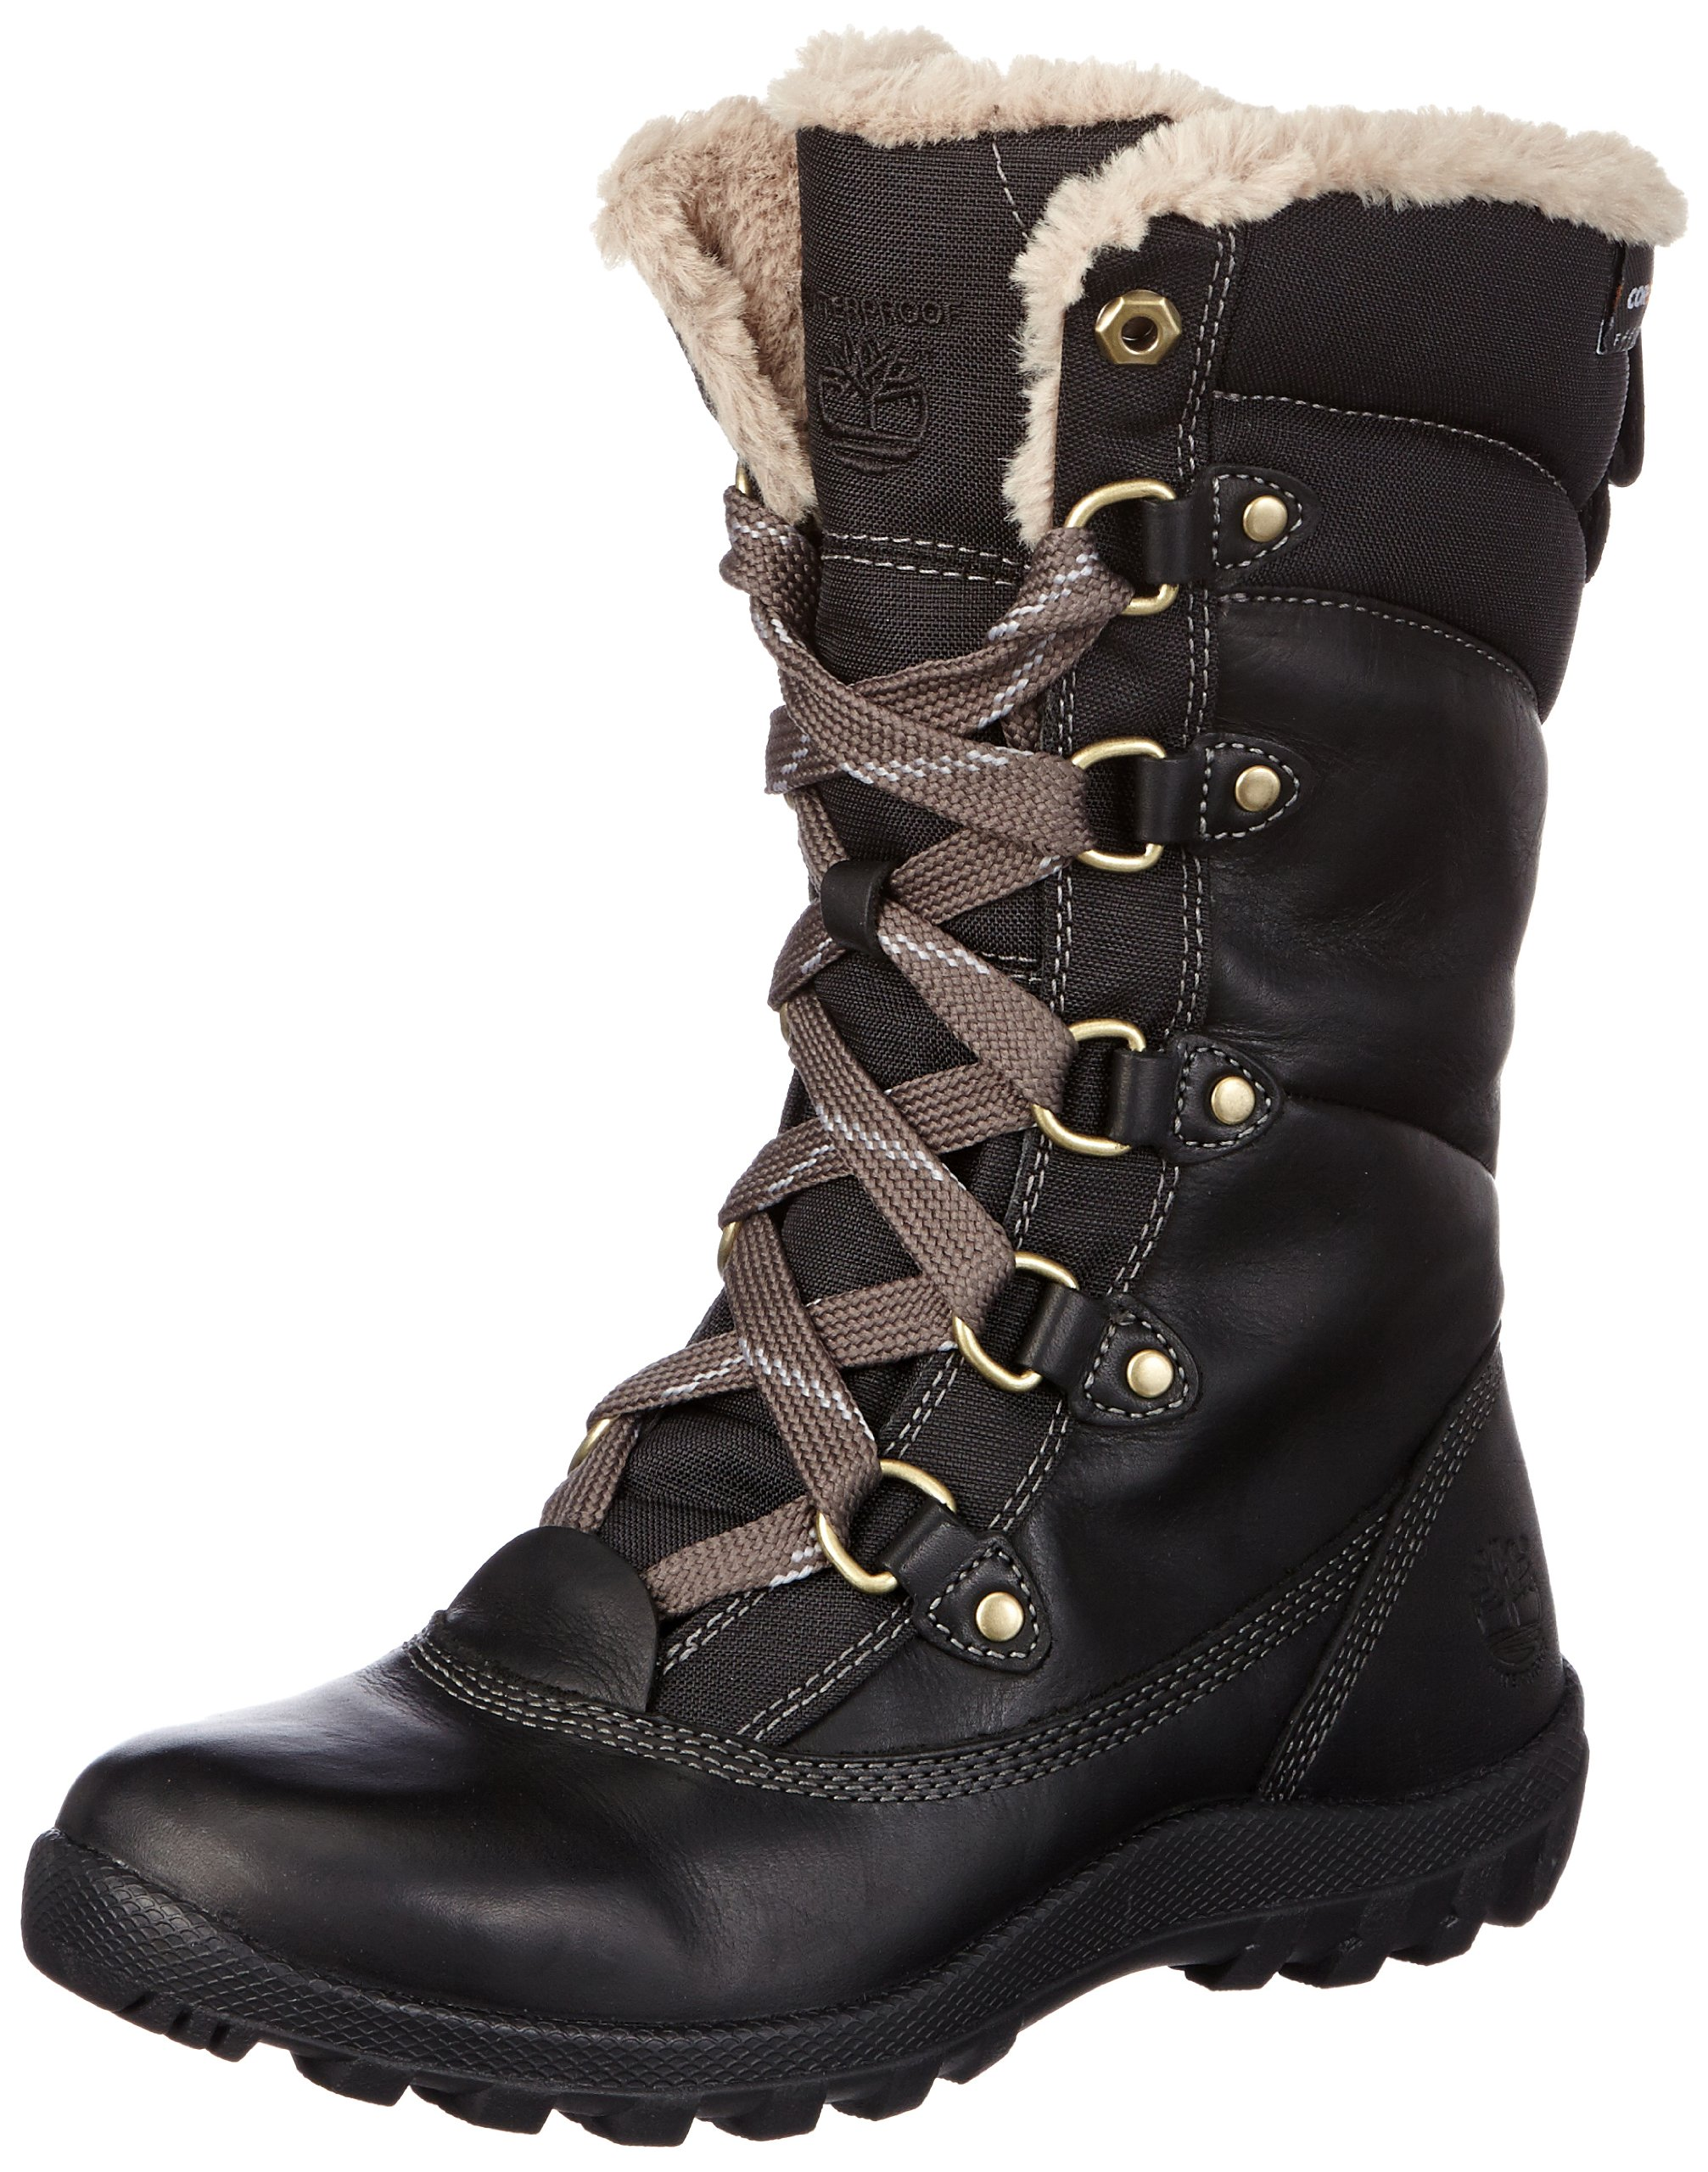 Timberland Women's MT Hope Mid L/F WP Boot,Black,8 M US